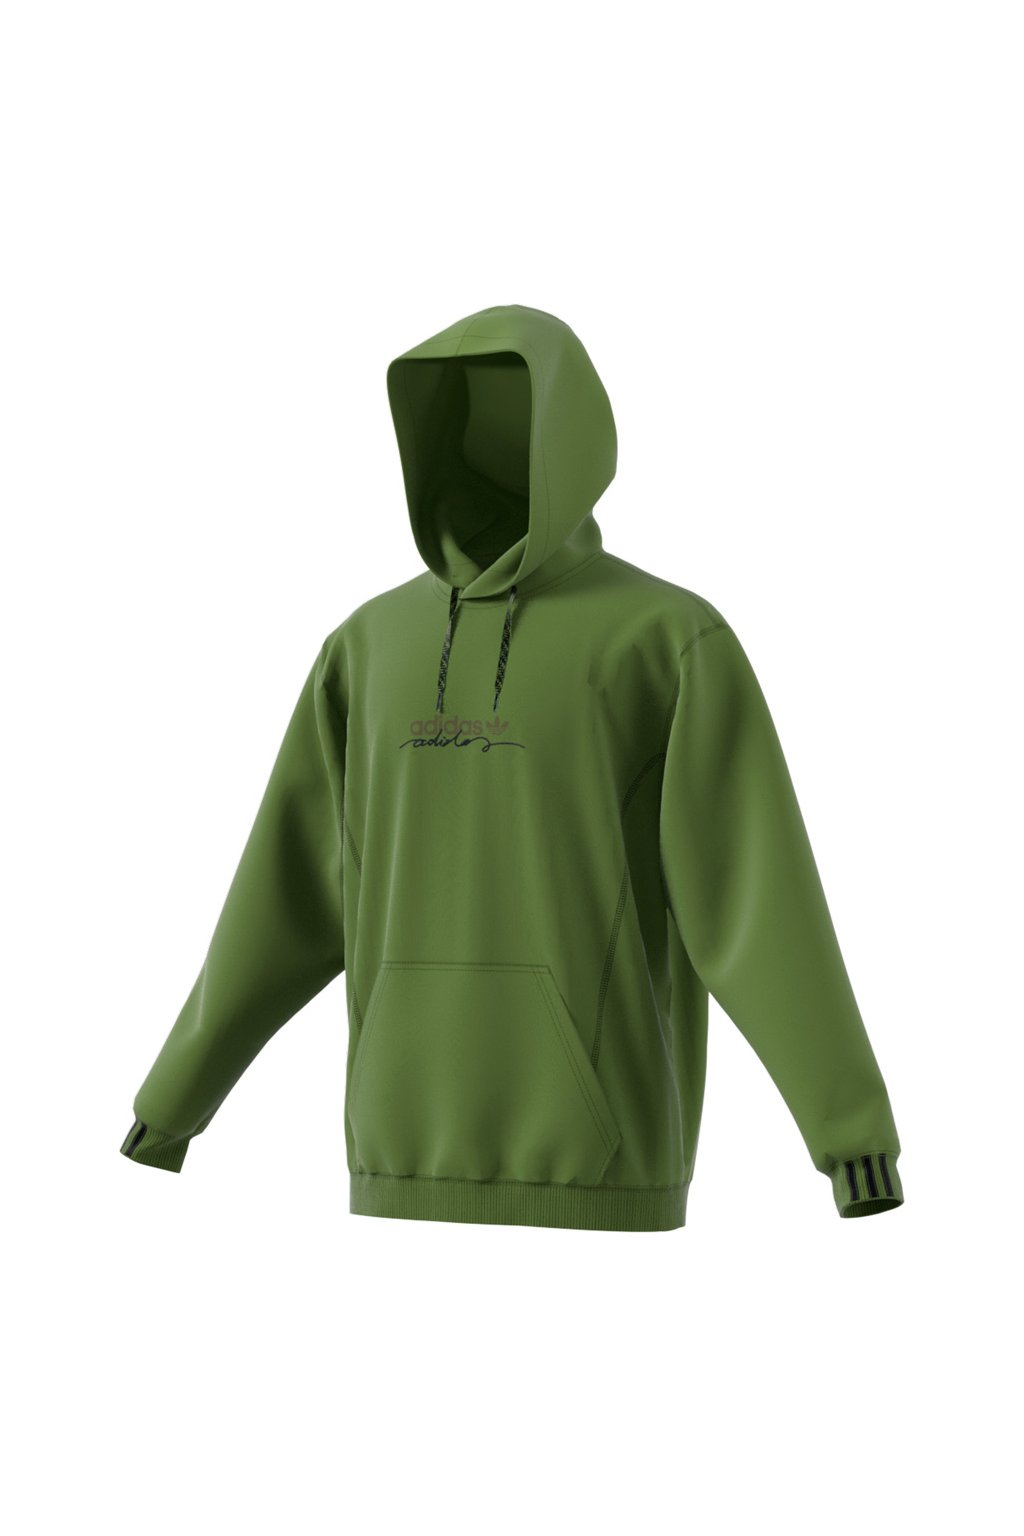 Pánska mikina Adidas D Hoody zelená GD9278